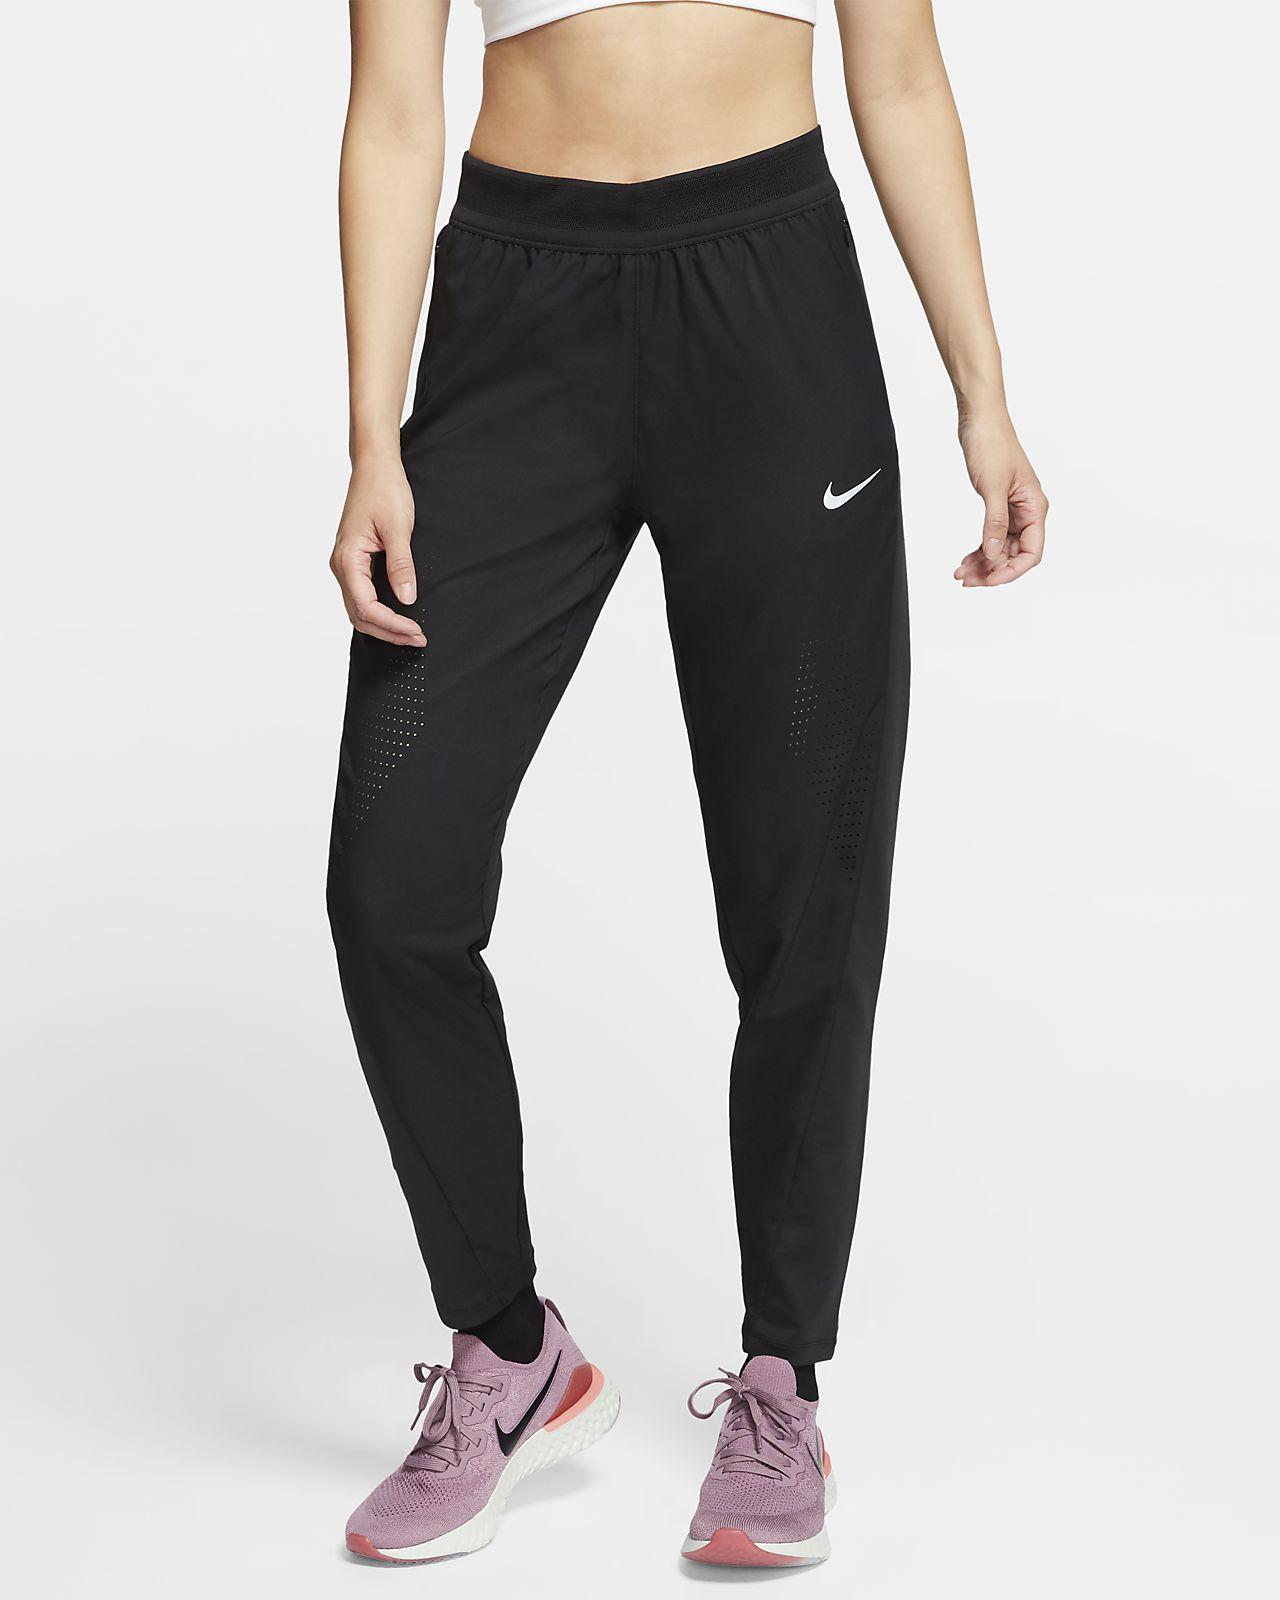 Pantalones de running para mujer Nike Swift